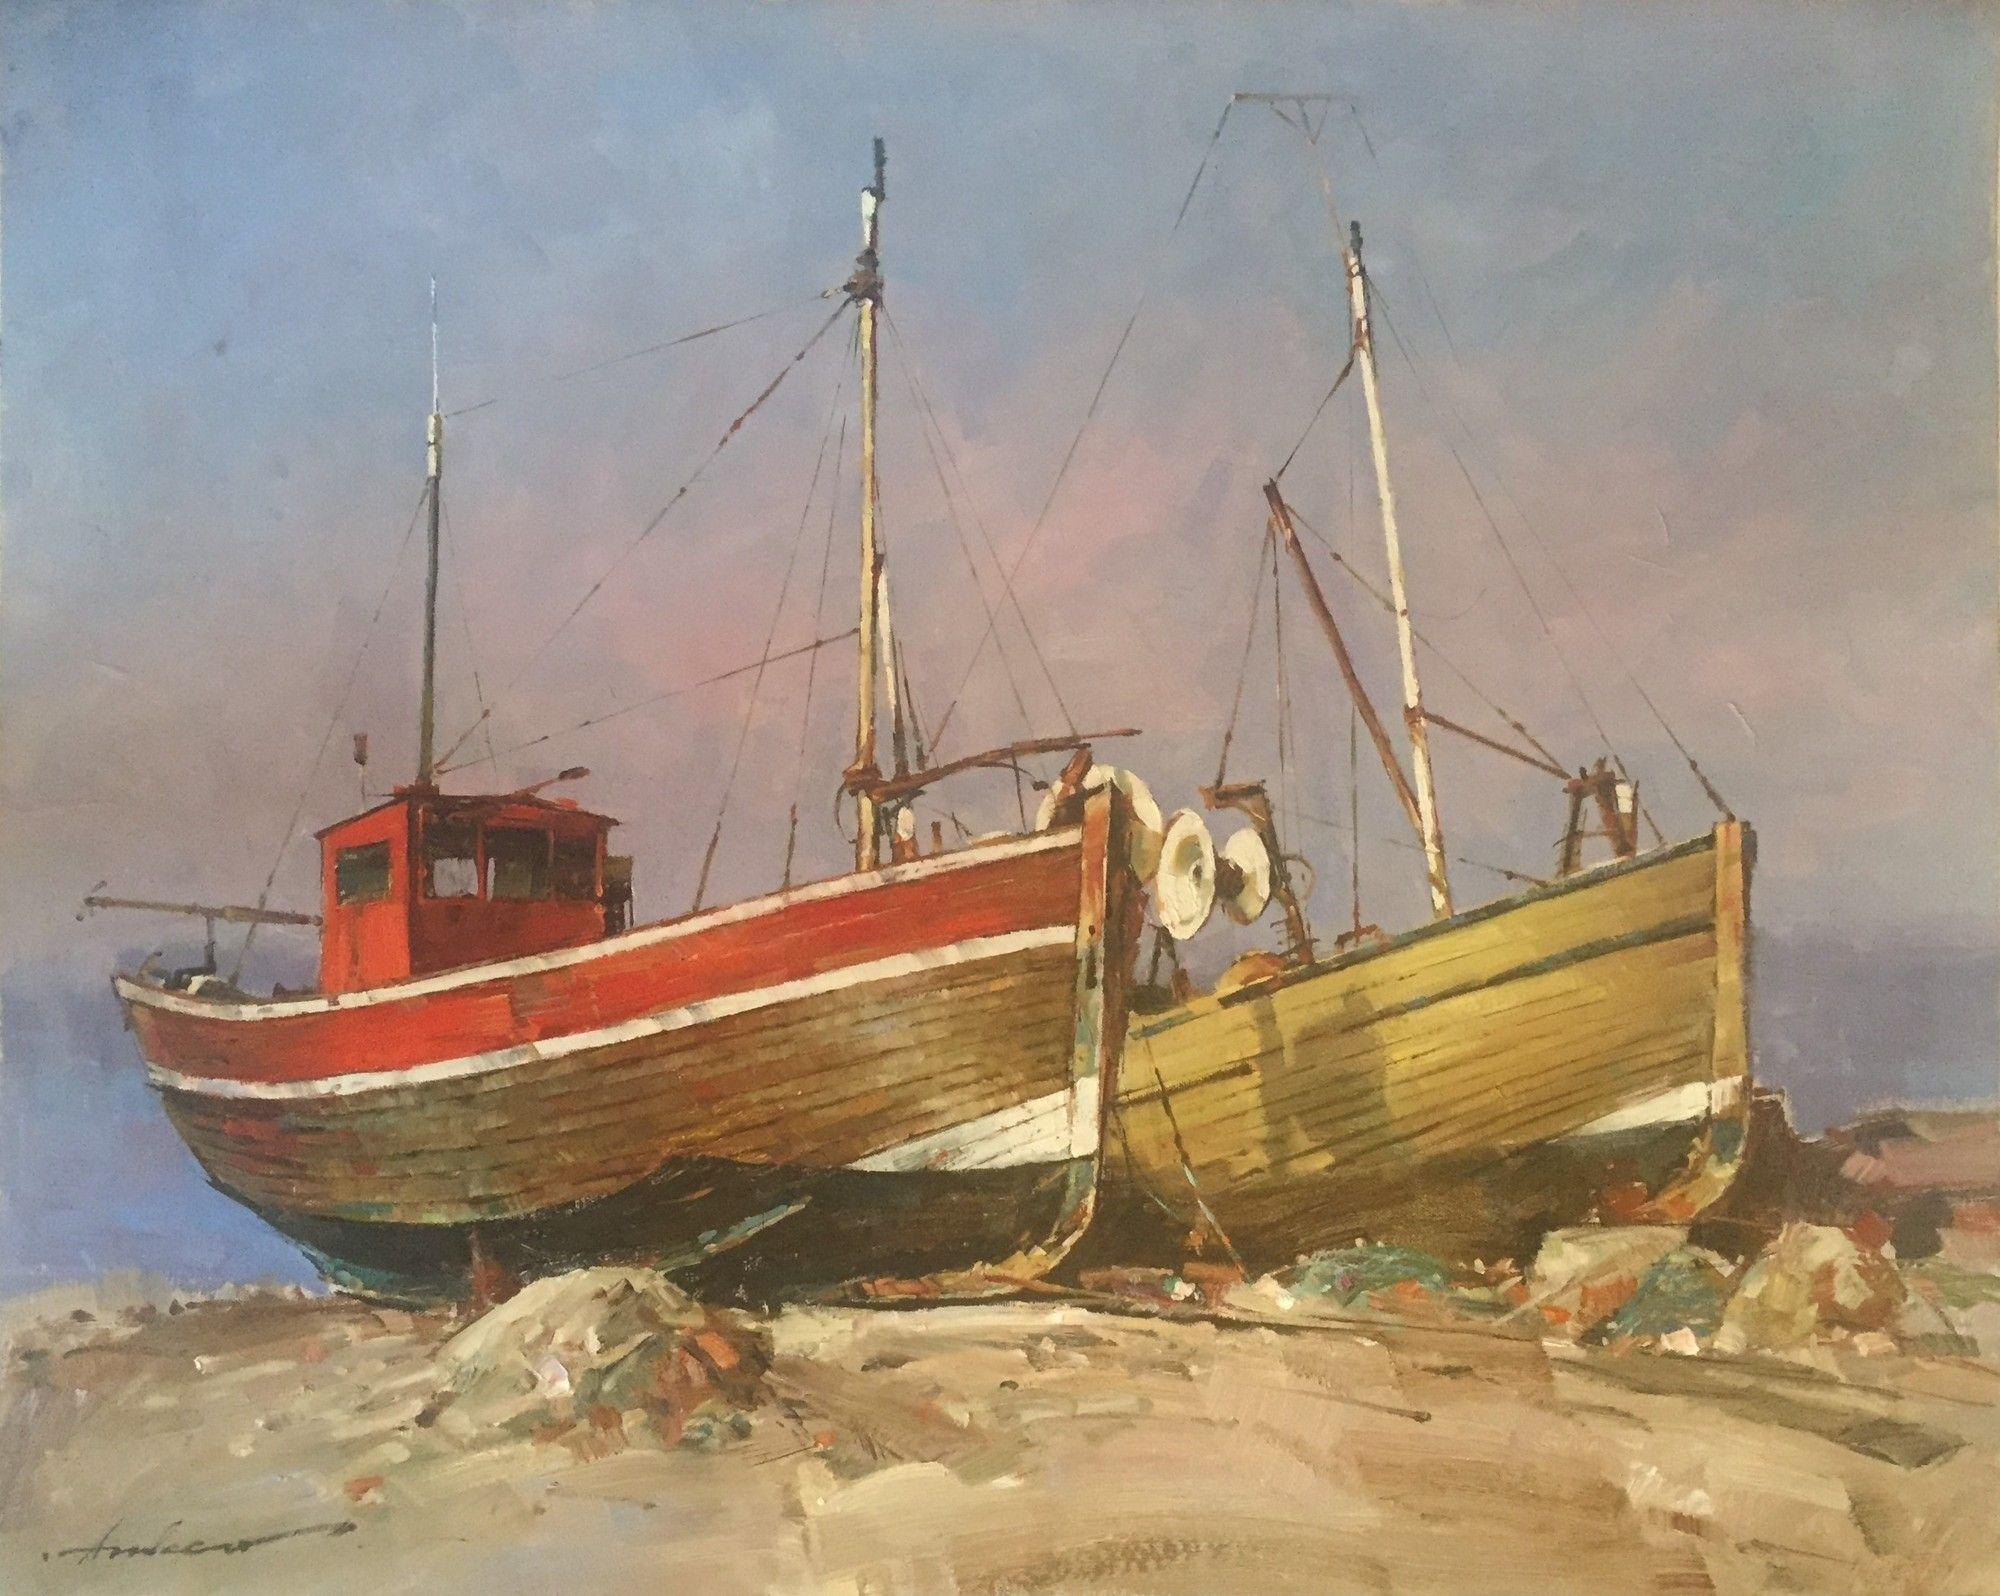 Old Fishing Boats By Andrei Atroshenko Copyright Remains With The Artist Andreiatroshenko Edinburghartfair Boat Art Marine Painting Boat Painting